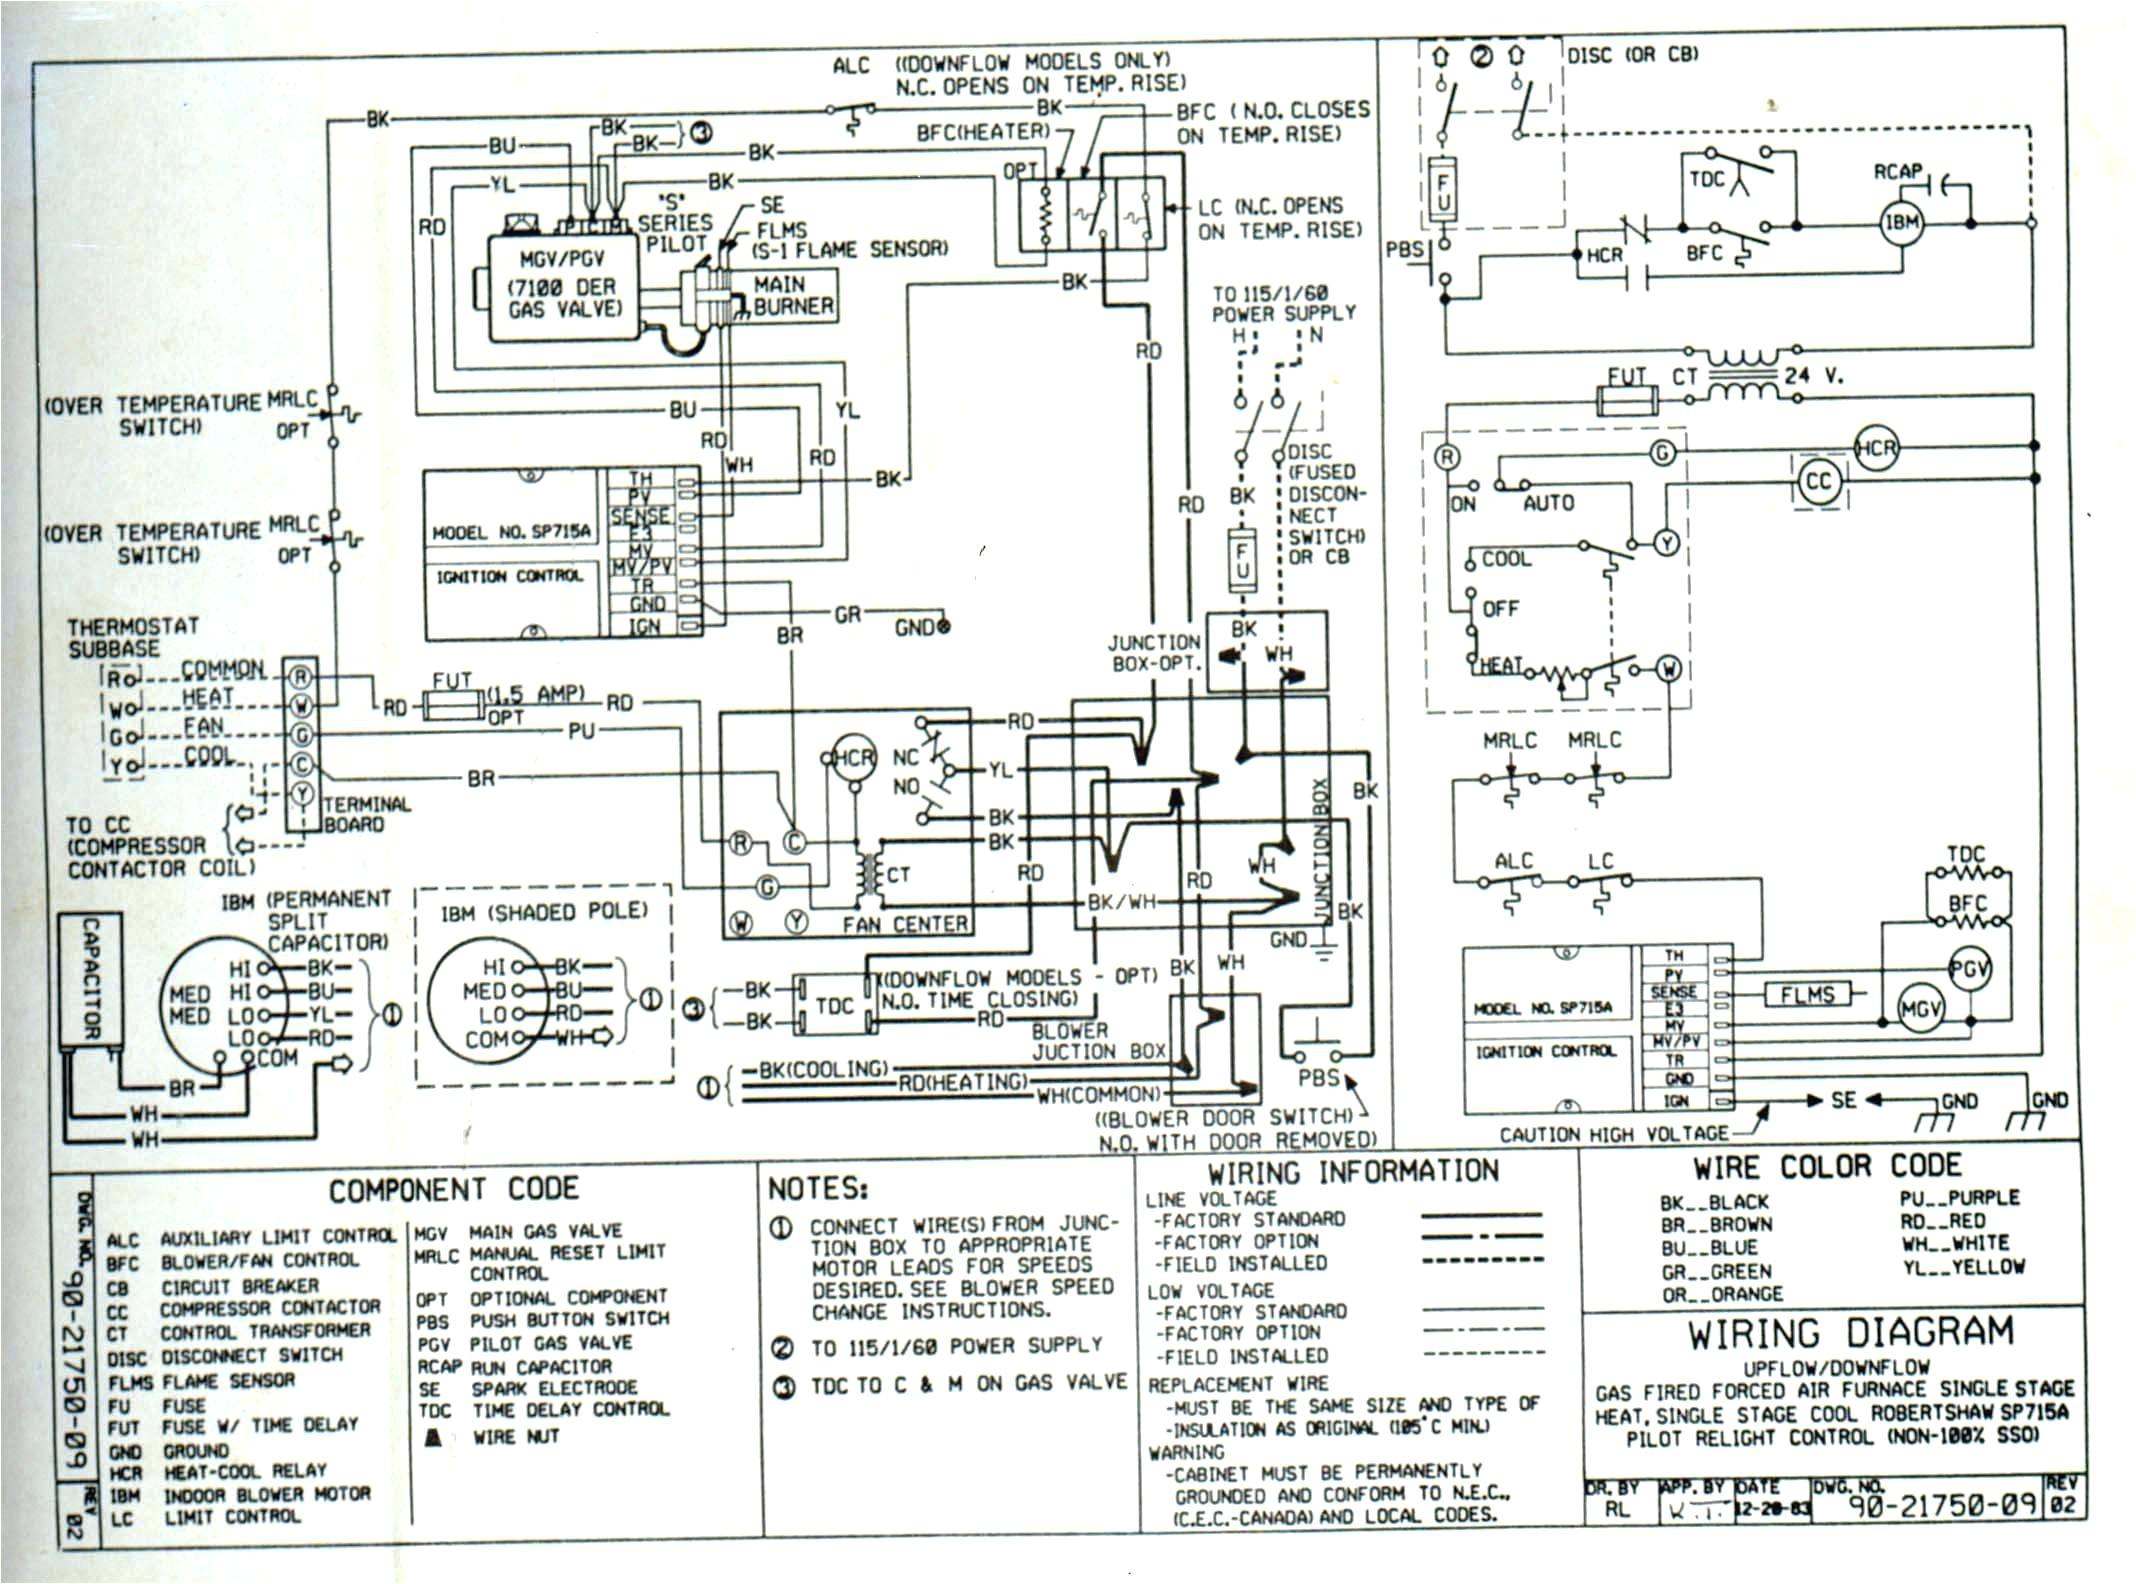 Trane Rooftop Unit Wiring Diagram Trane Rooftop Ac Wiring Diagrams Wiring Diagram Long